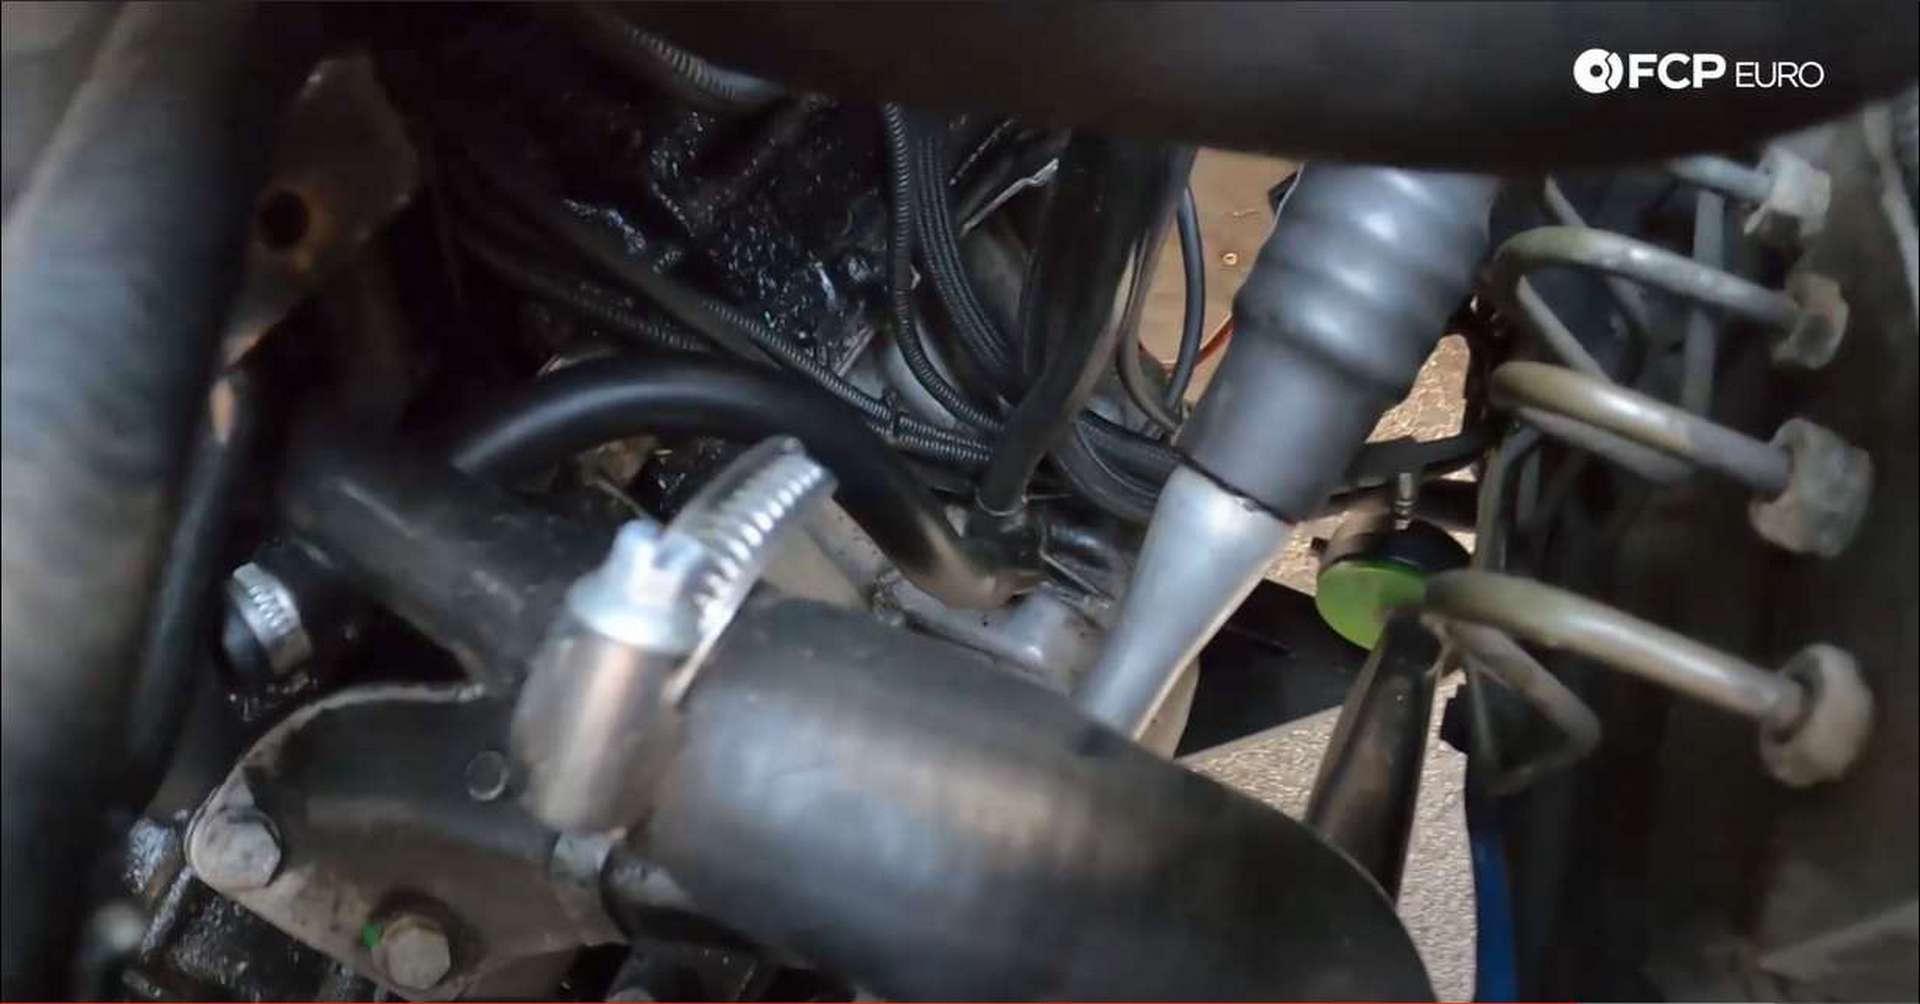 DIY BMW M50 Intake Manifold crankcase vent return line